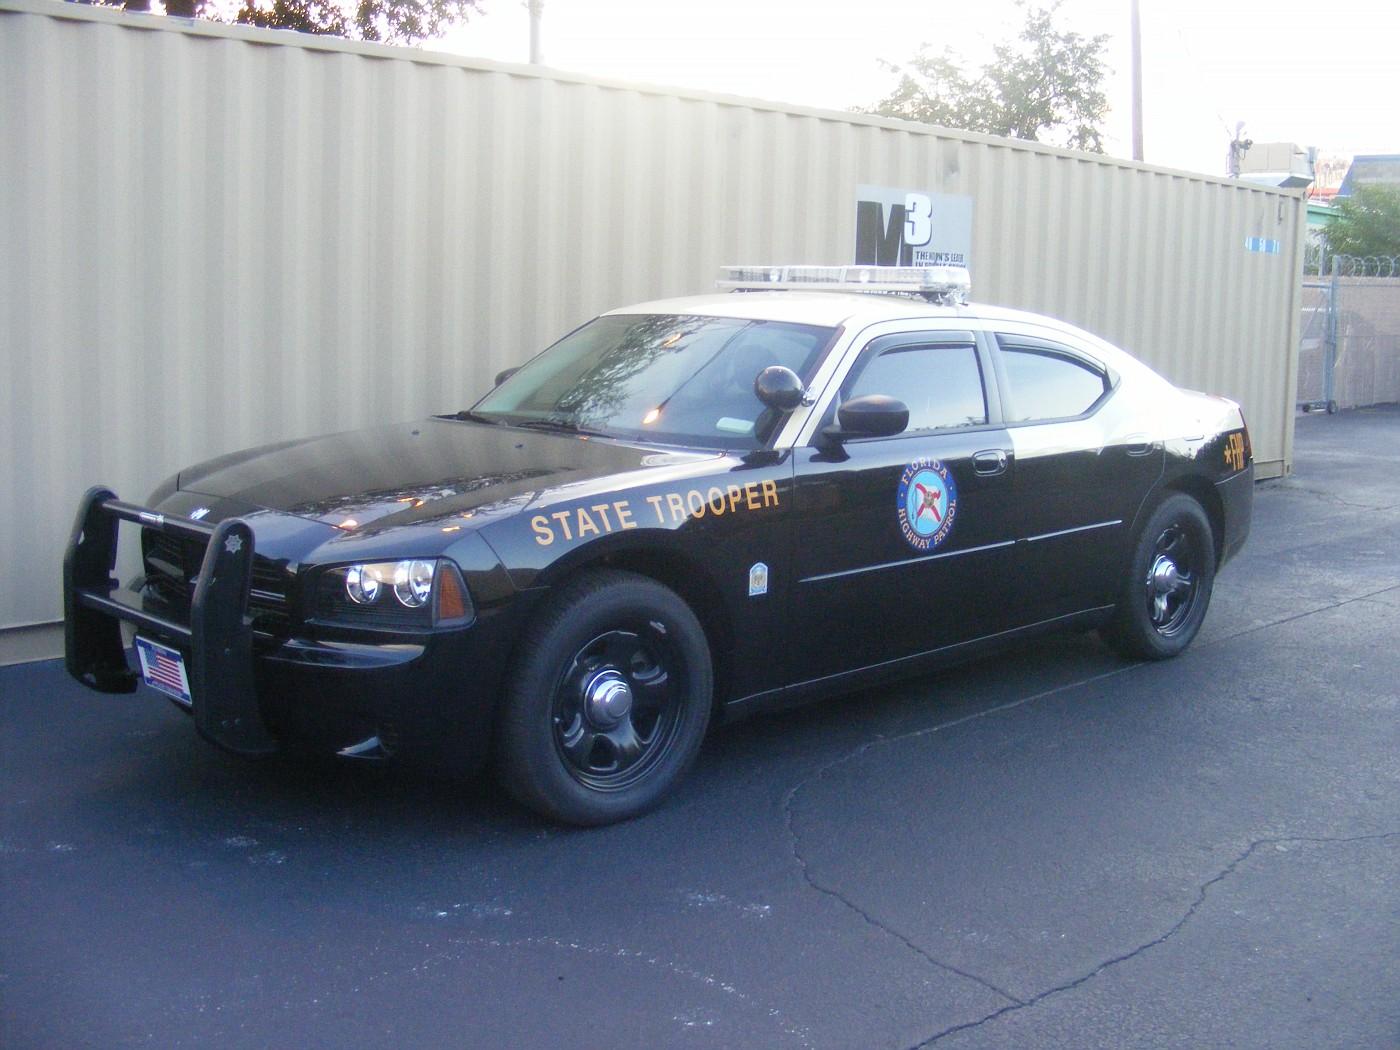 FL - Florida Highway Patrol